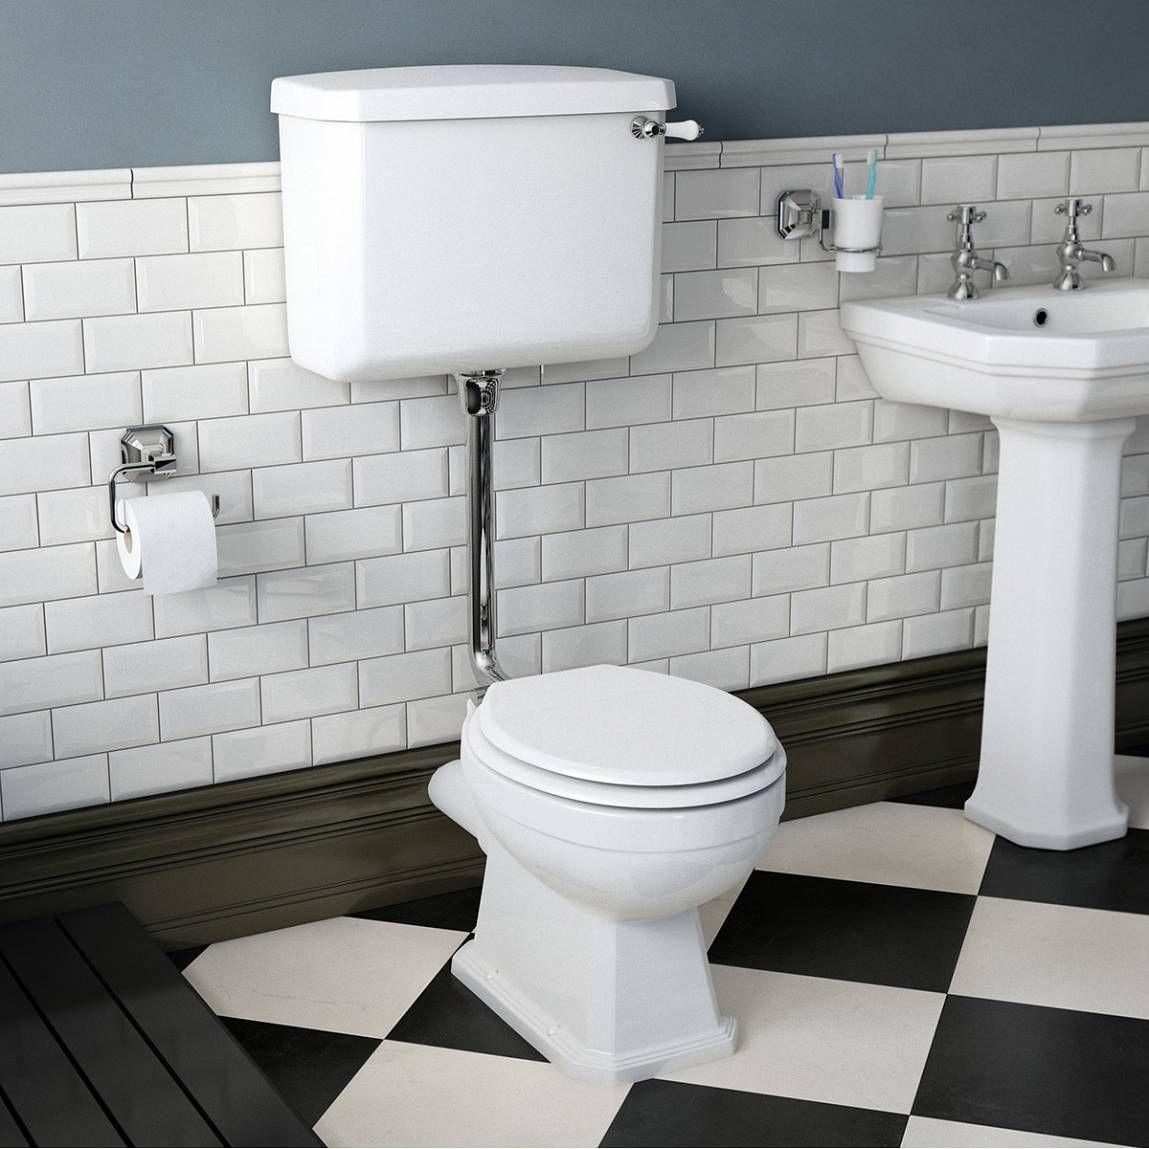 Regency Low Level Toilet inc Luxury White MDF Seat - Victoria Plumb ...